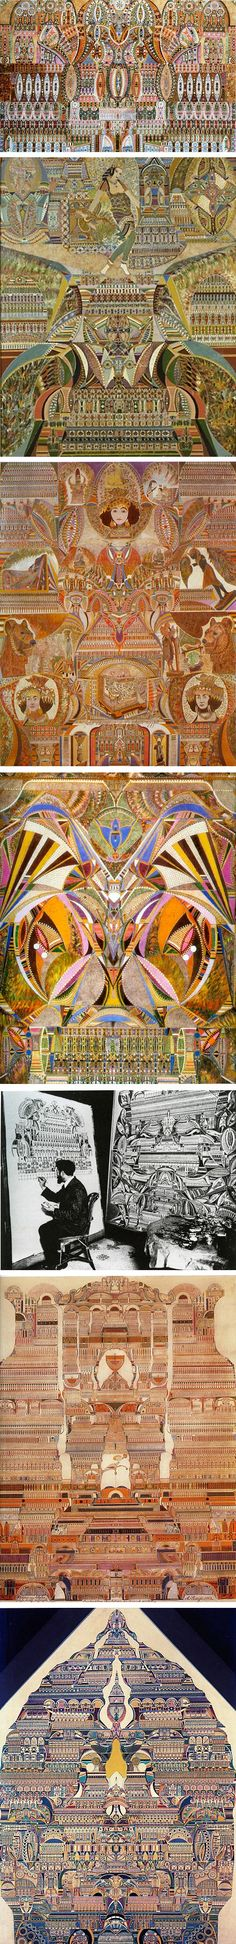 Augustin Lesage. Coal miner turned kaleidoscopic painter.